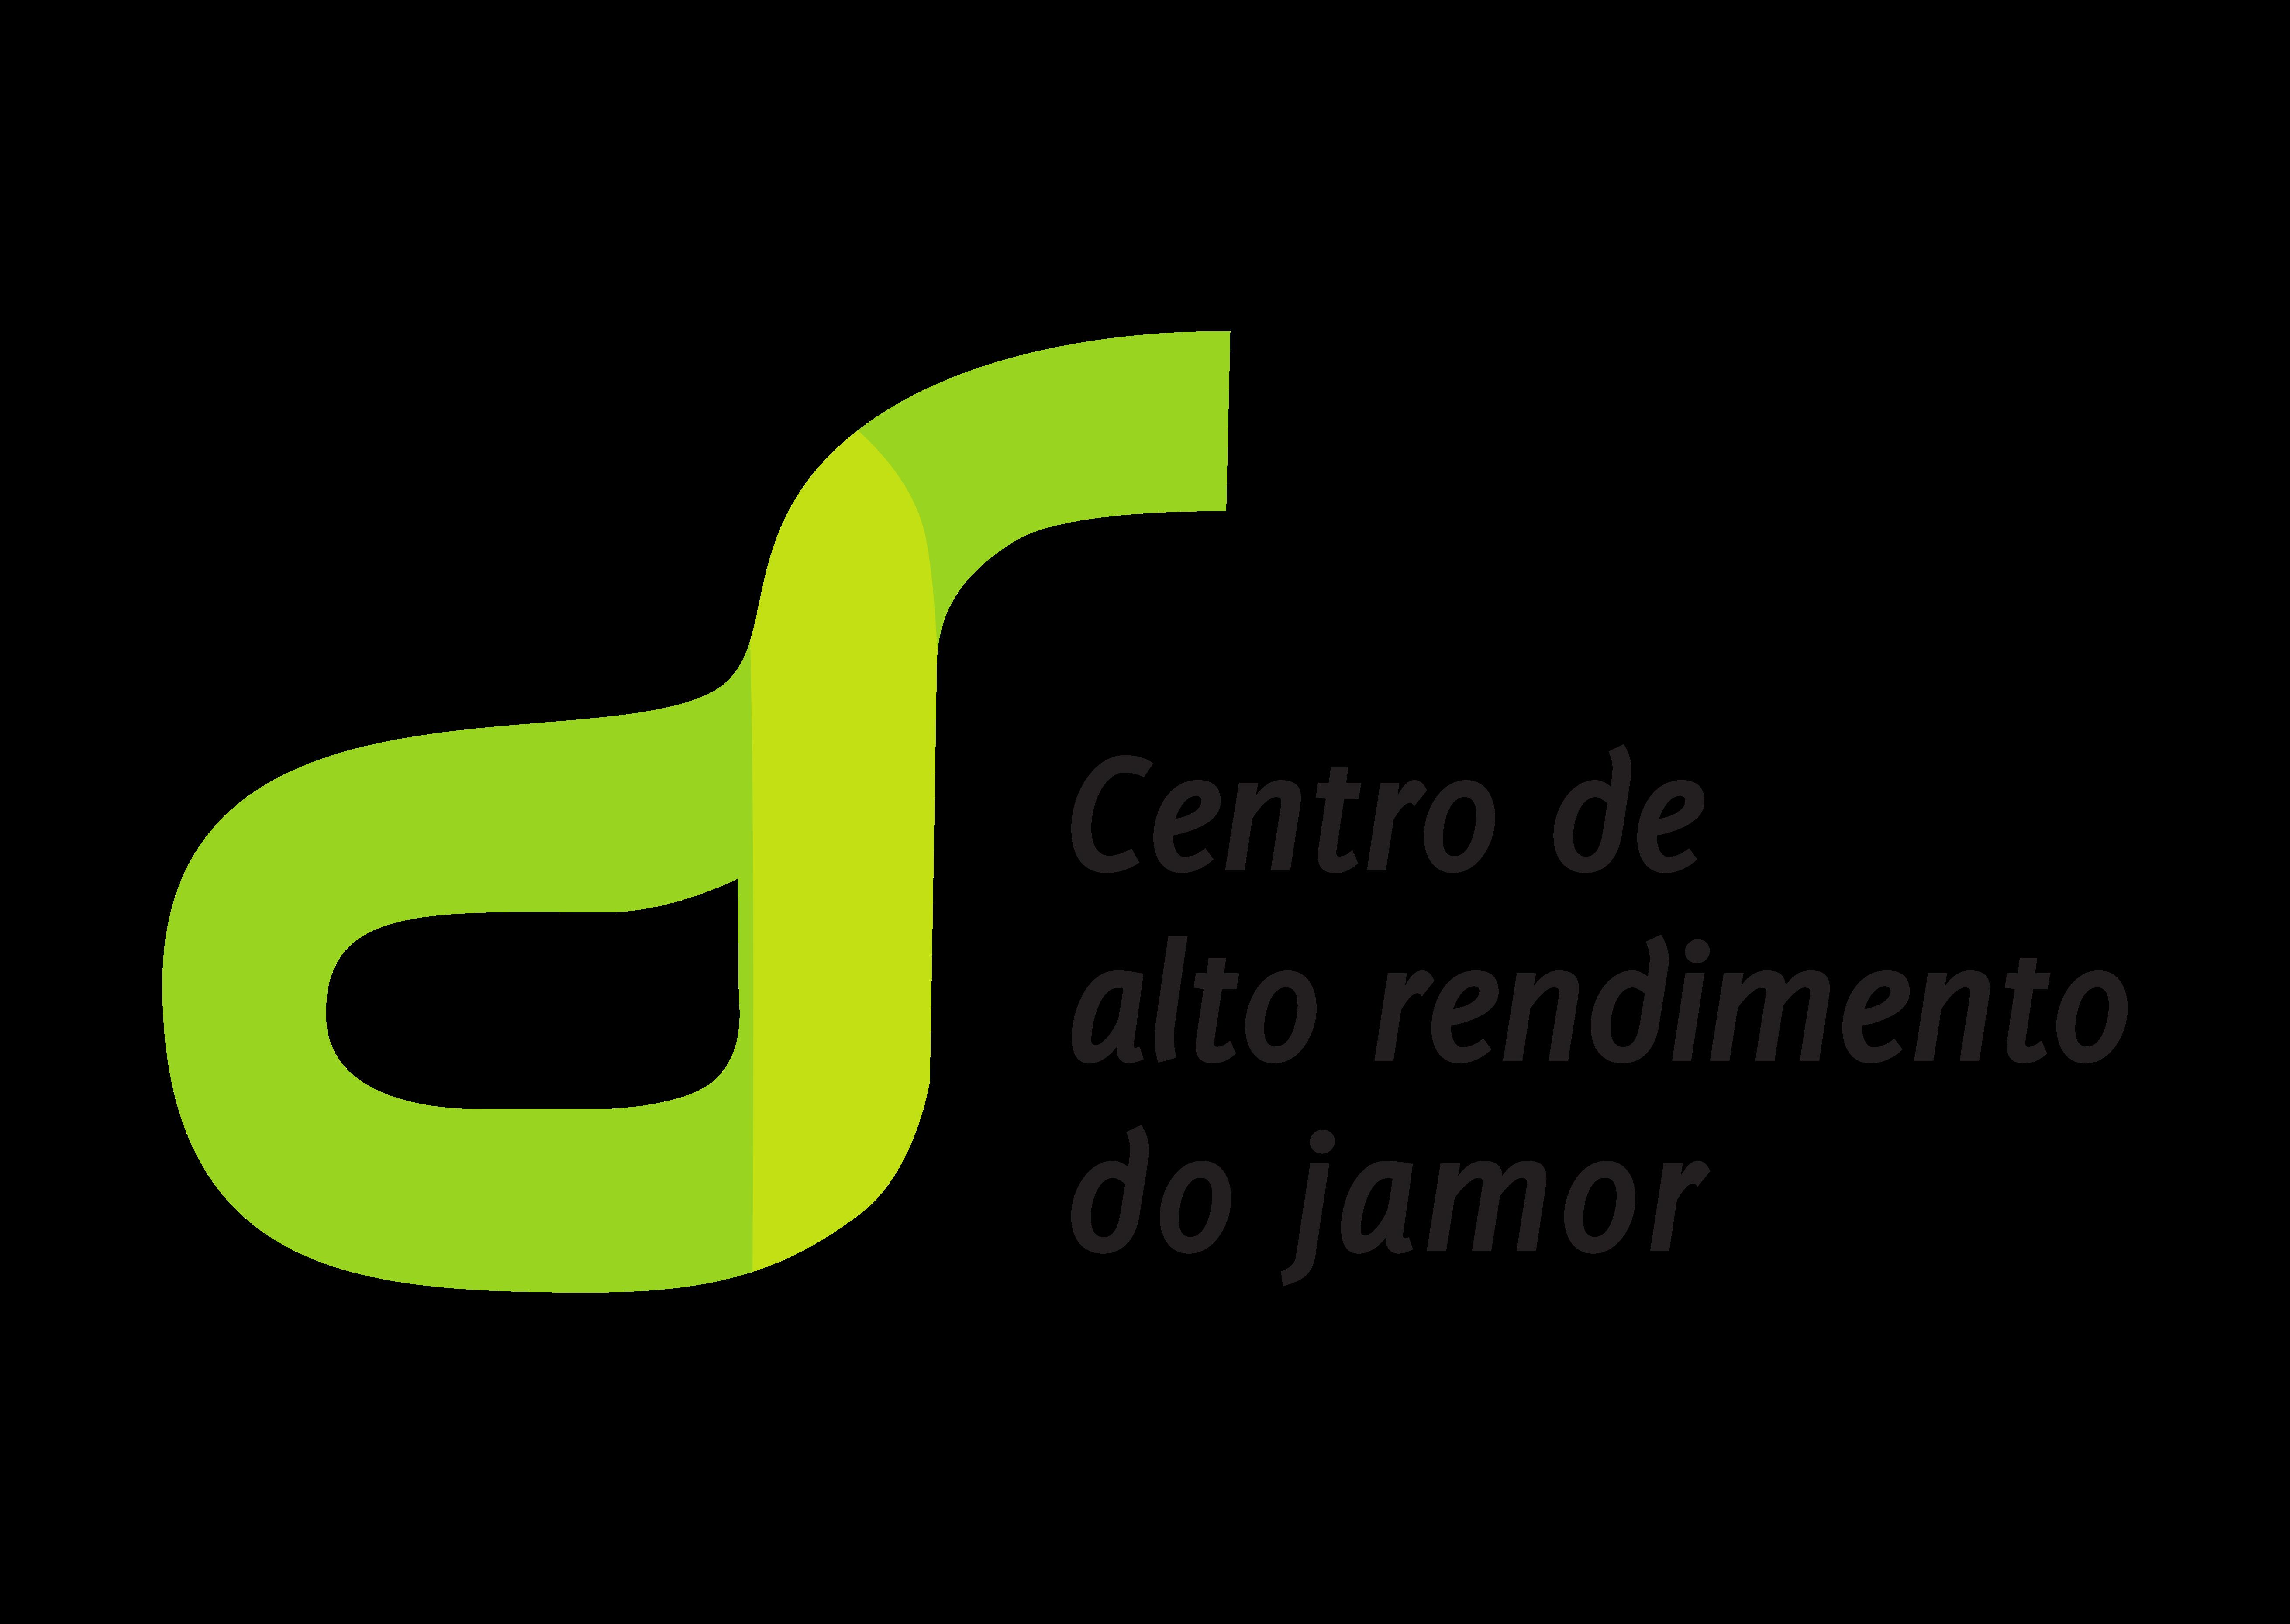 Logo Centro de Alto Rendimento do Jamor